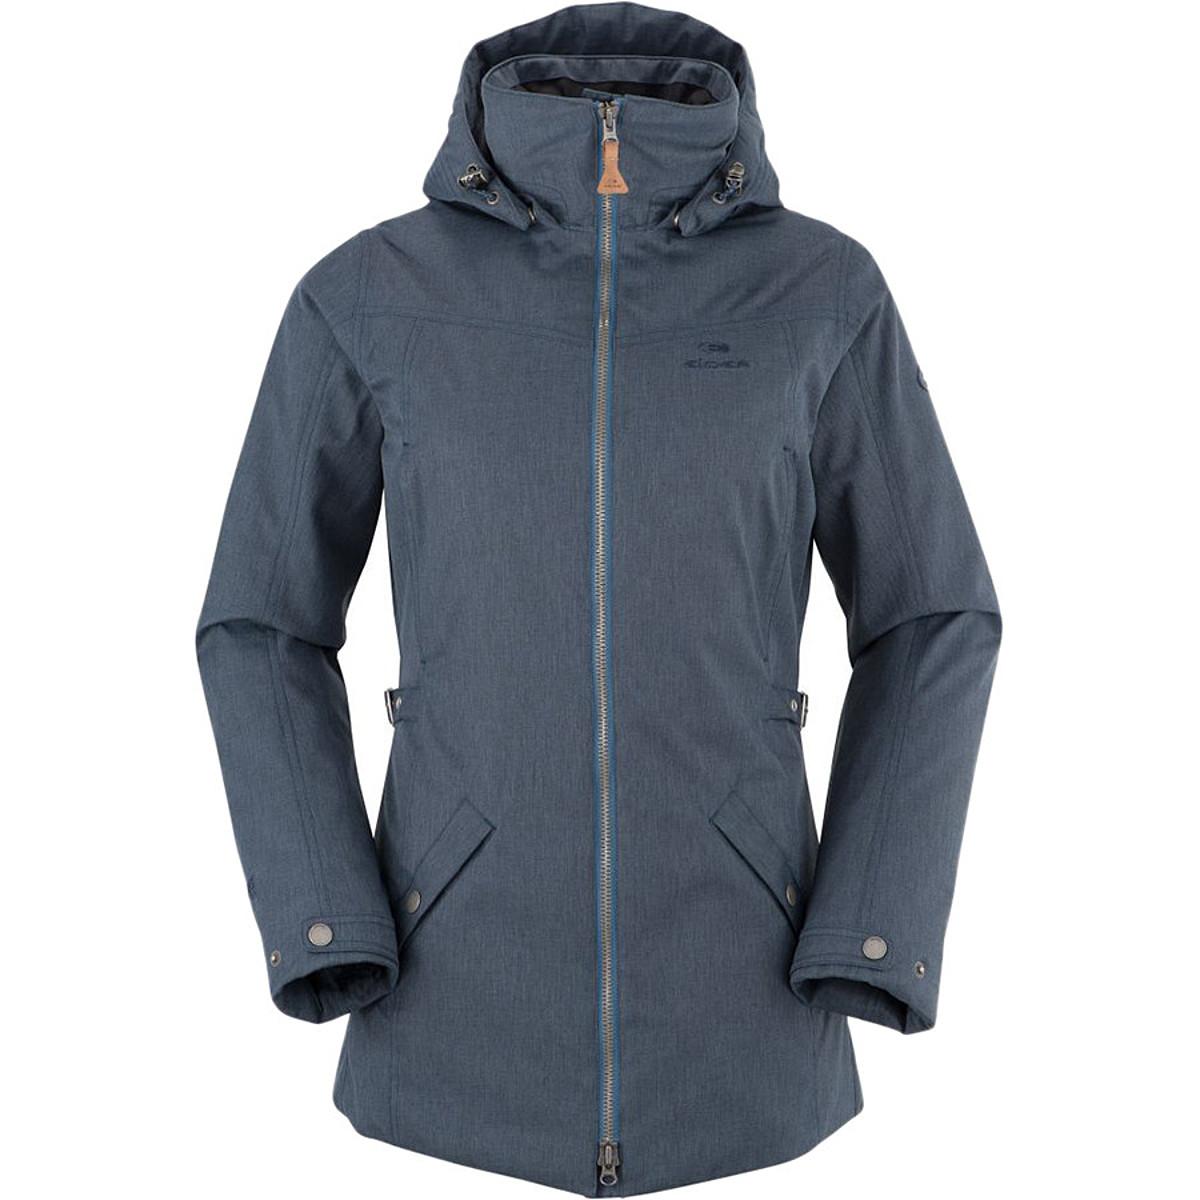 Eider Montmin II Jacket